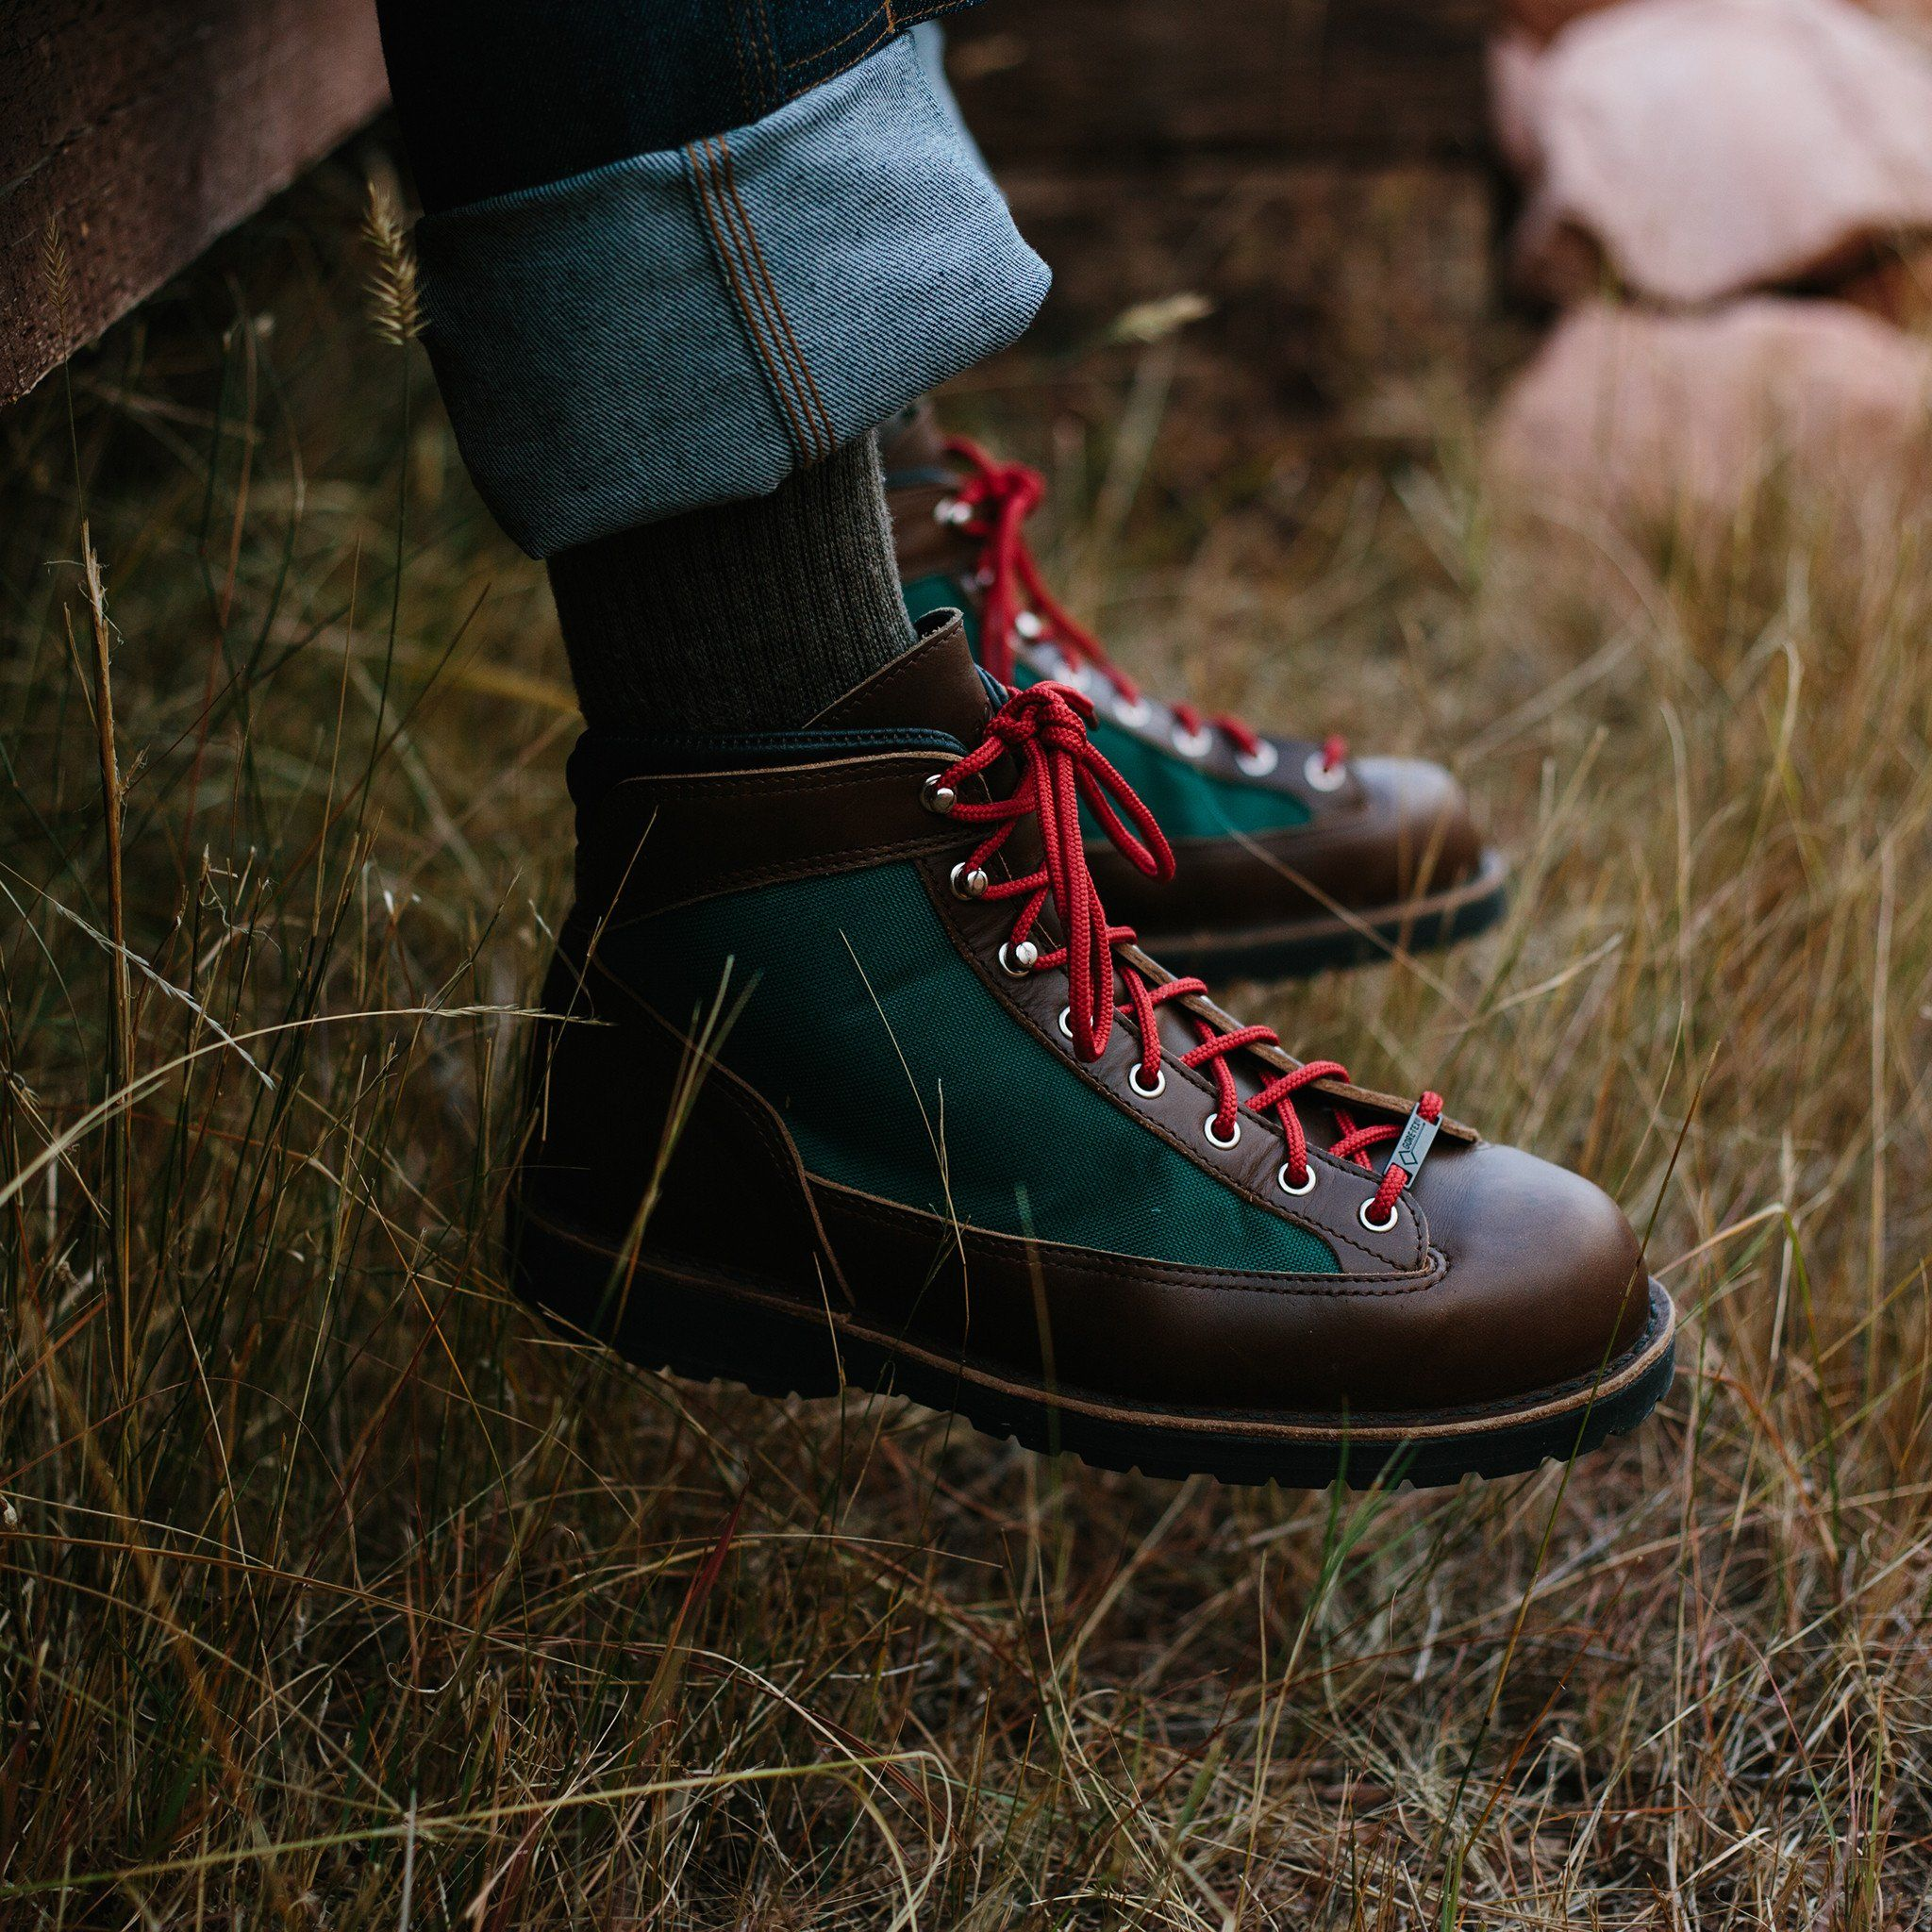 X Danner Mountain Light Boot In 2019 Topo X